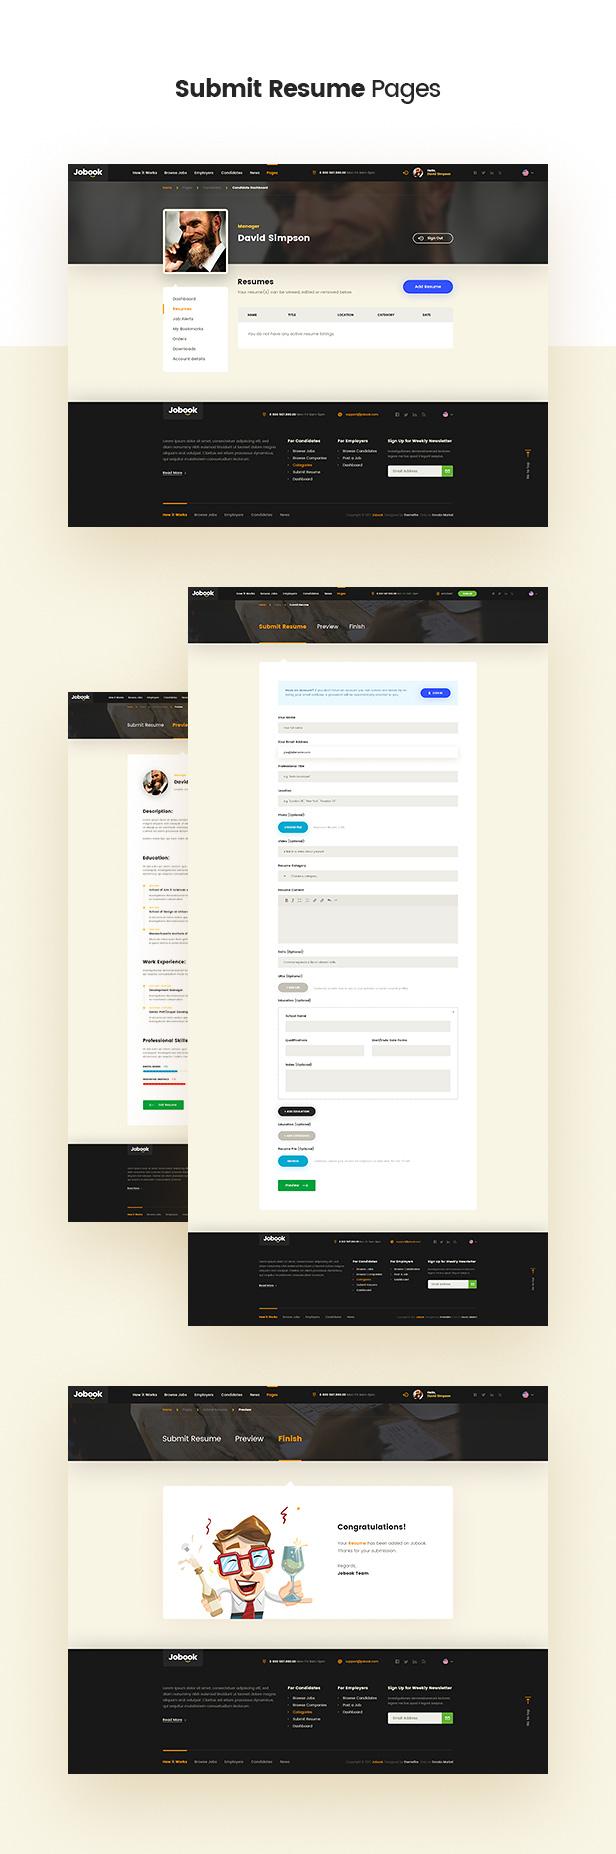 Jobook - A Unique Job Board Website PSD Template - 7